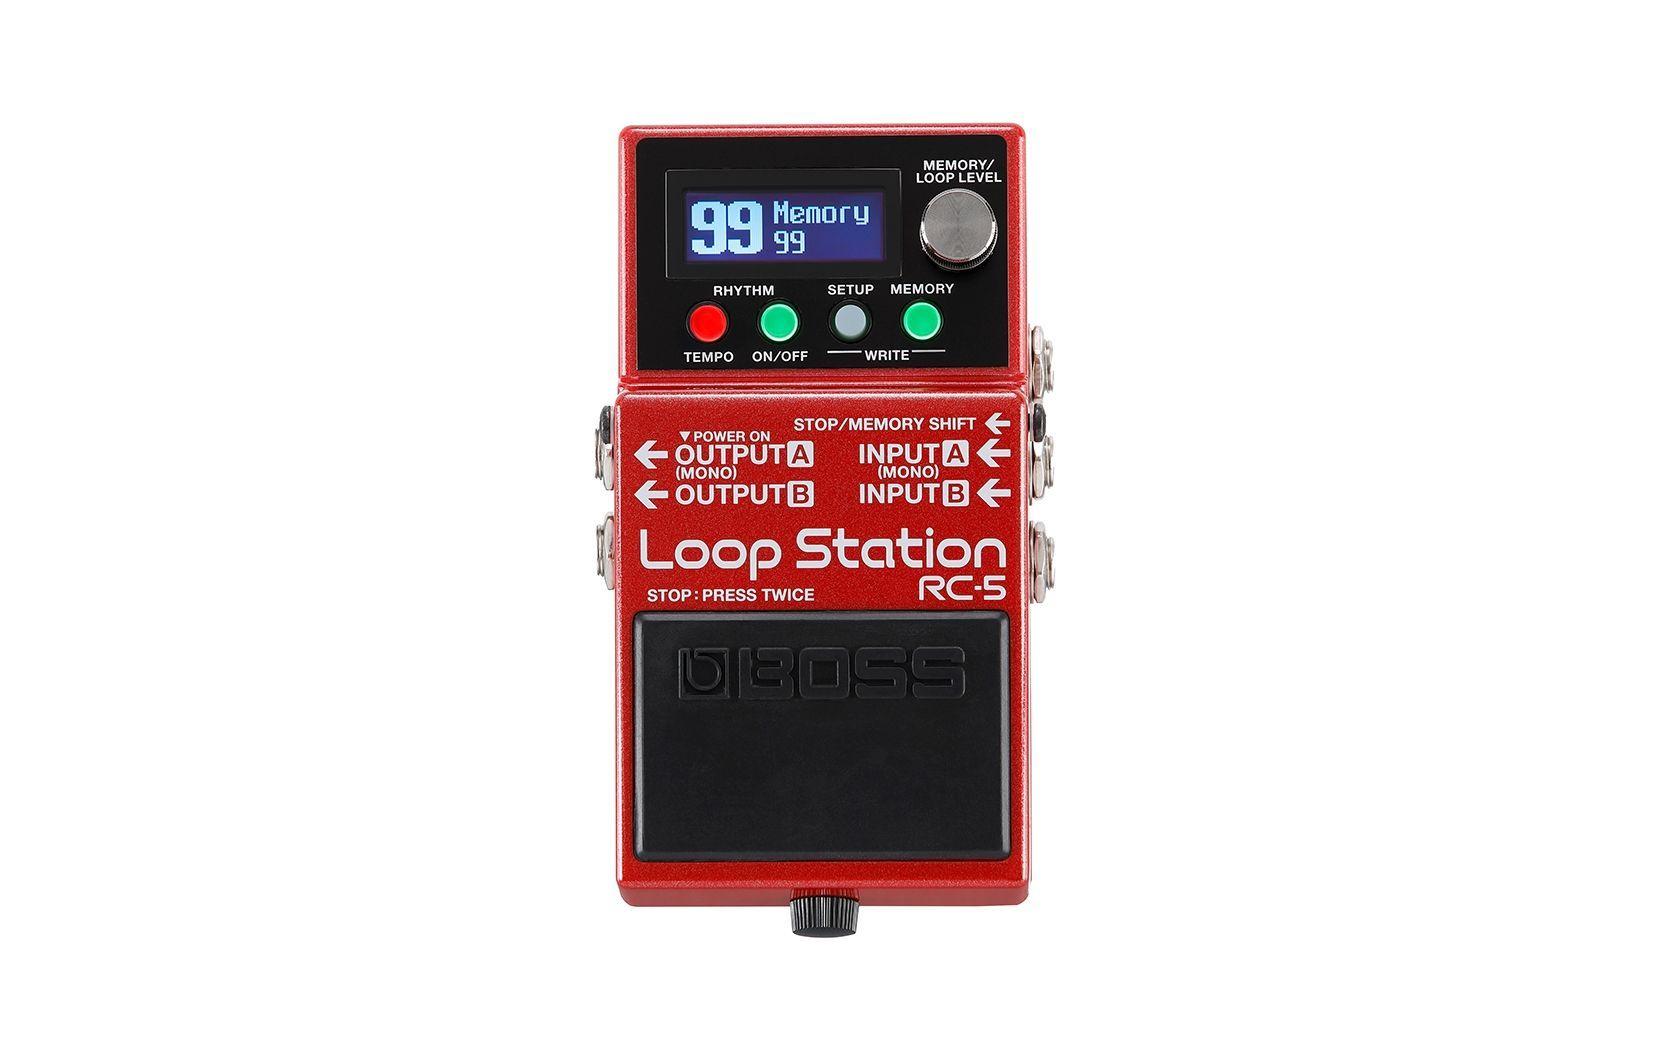 Boss RC-5 Loop Station, Effektgerät für E-Gitarre